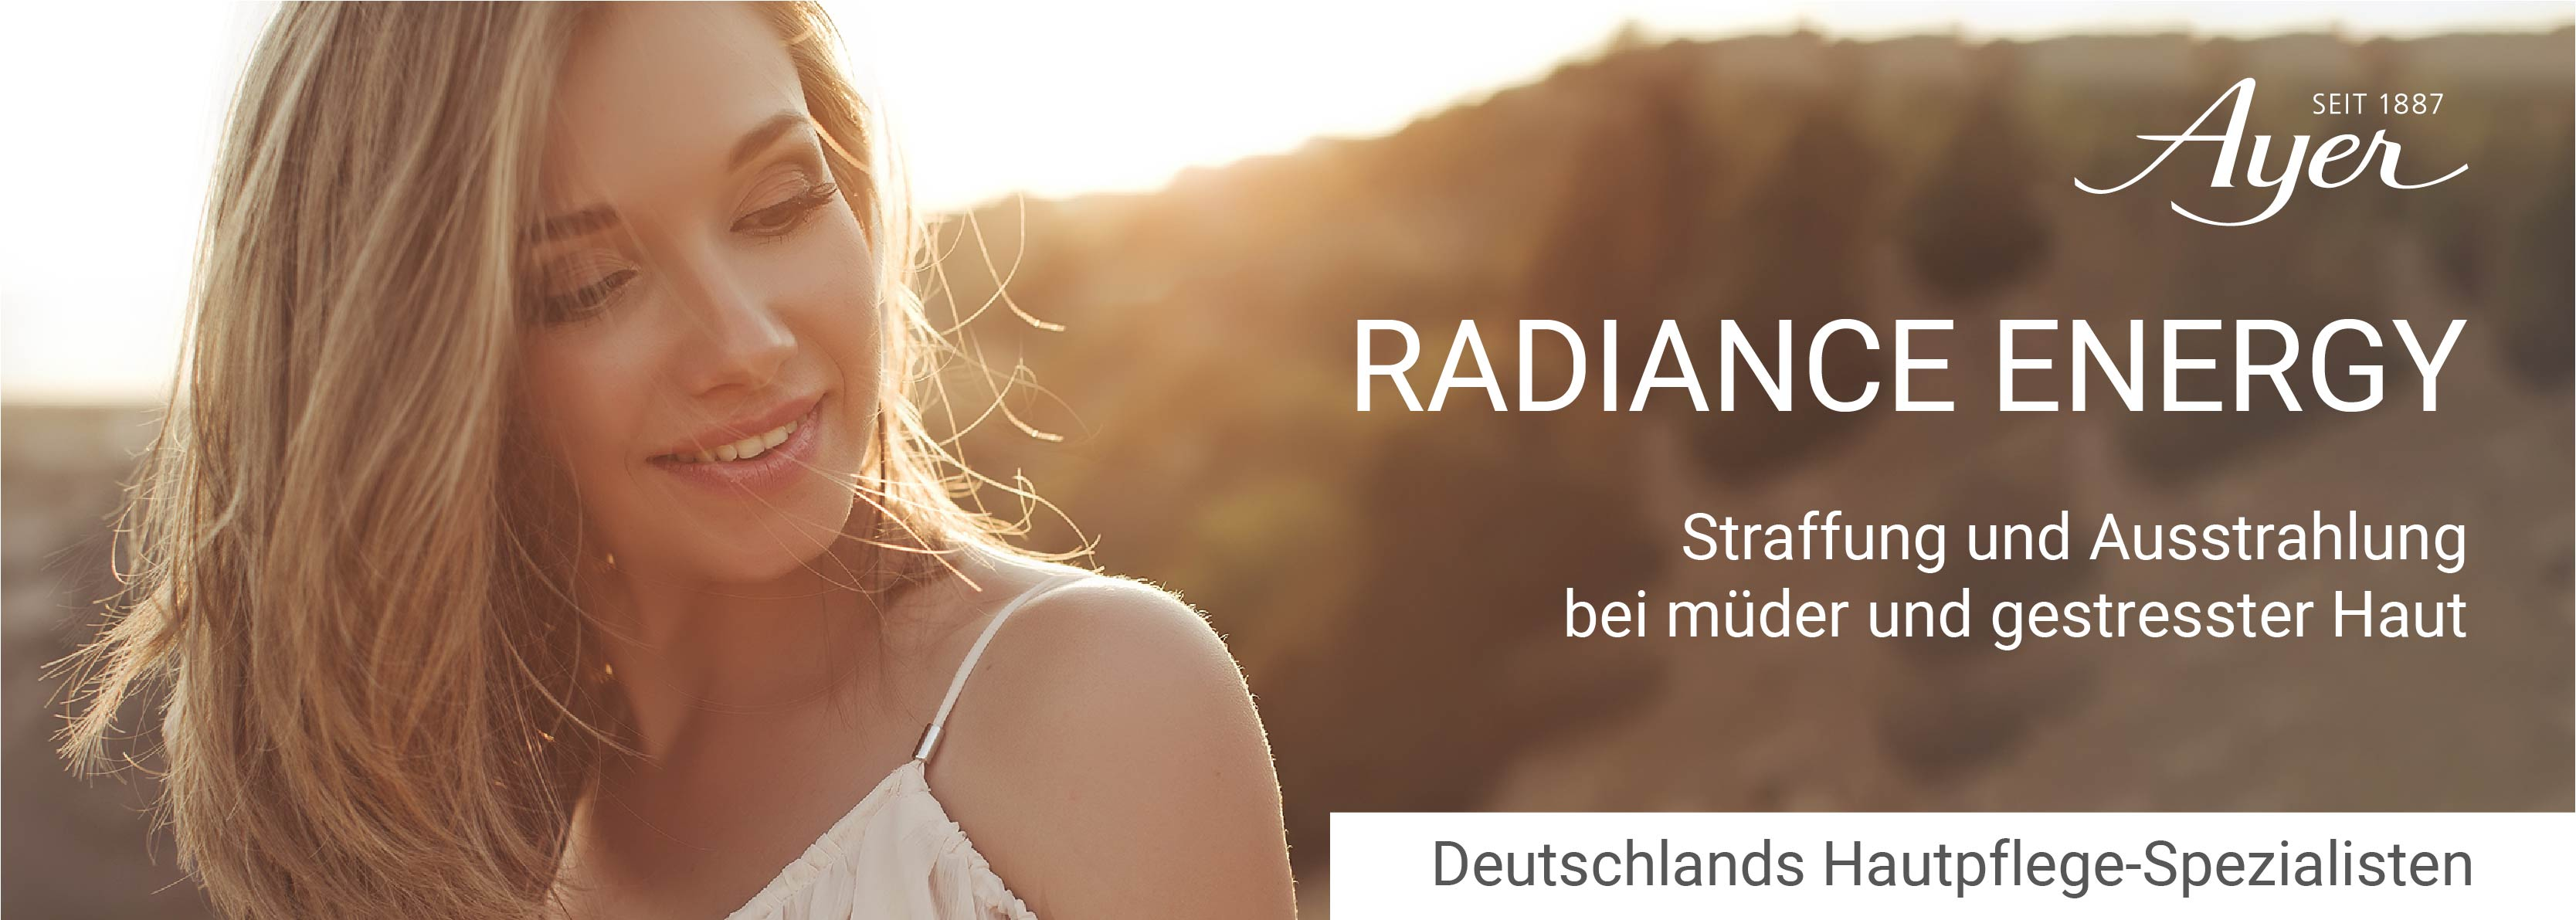 Radiance-Energie